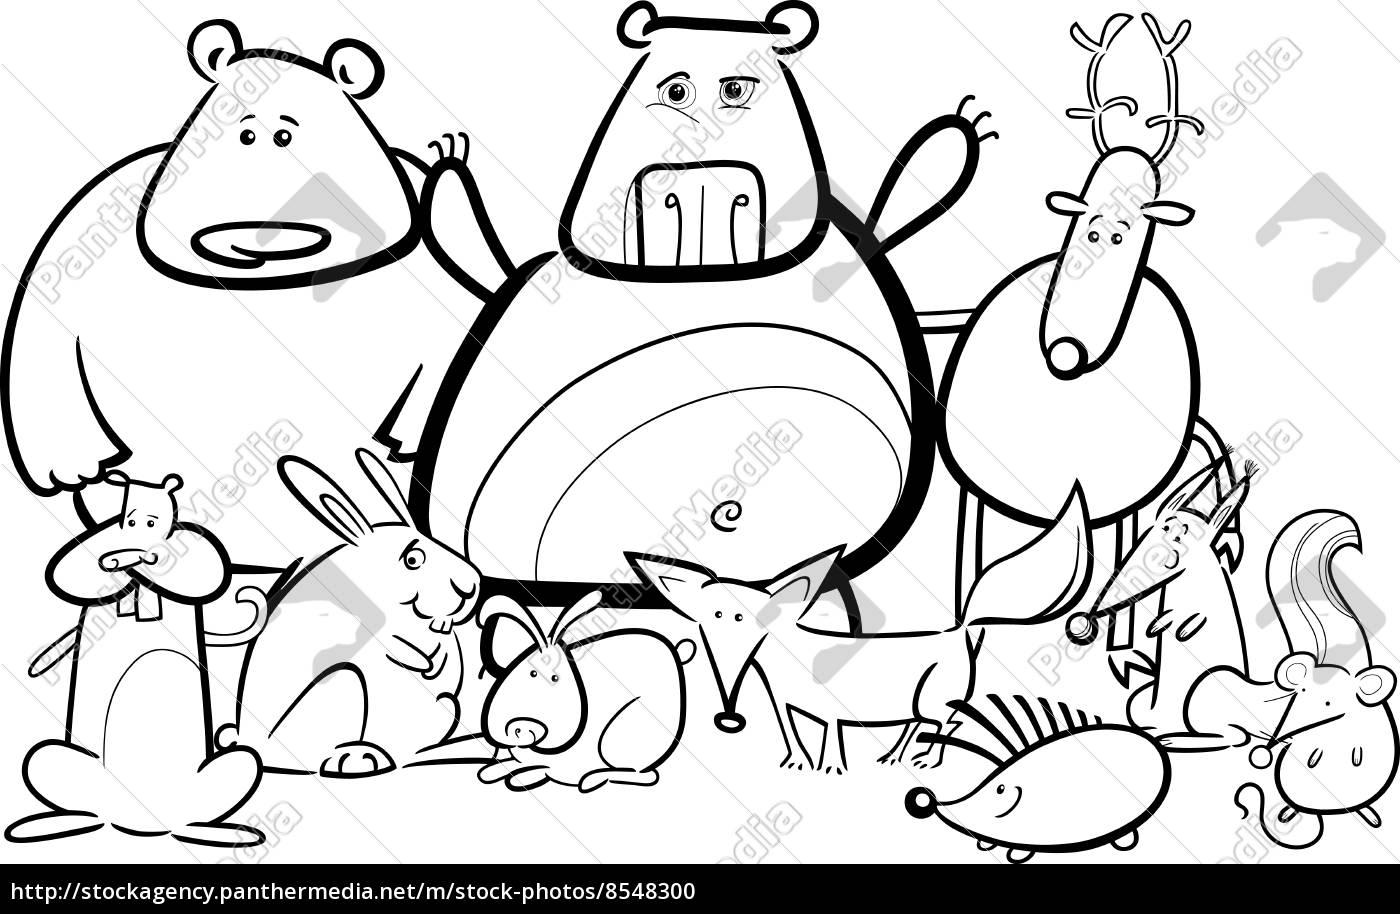 Dibujo Animado Grupo De Animales Salvajes Para Colorear